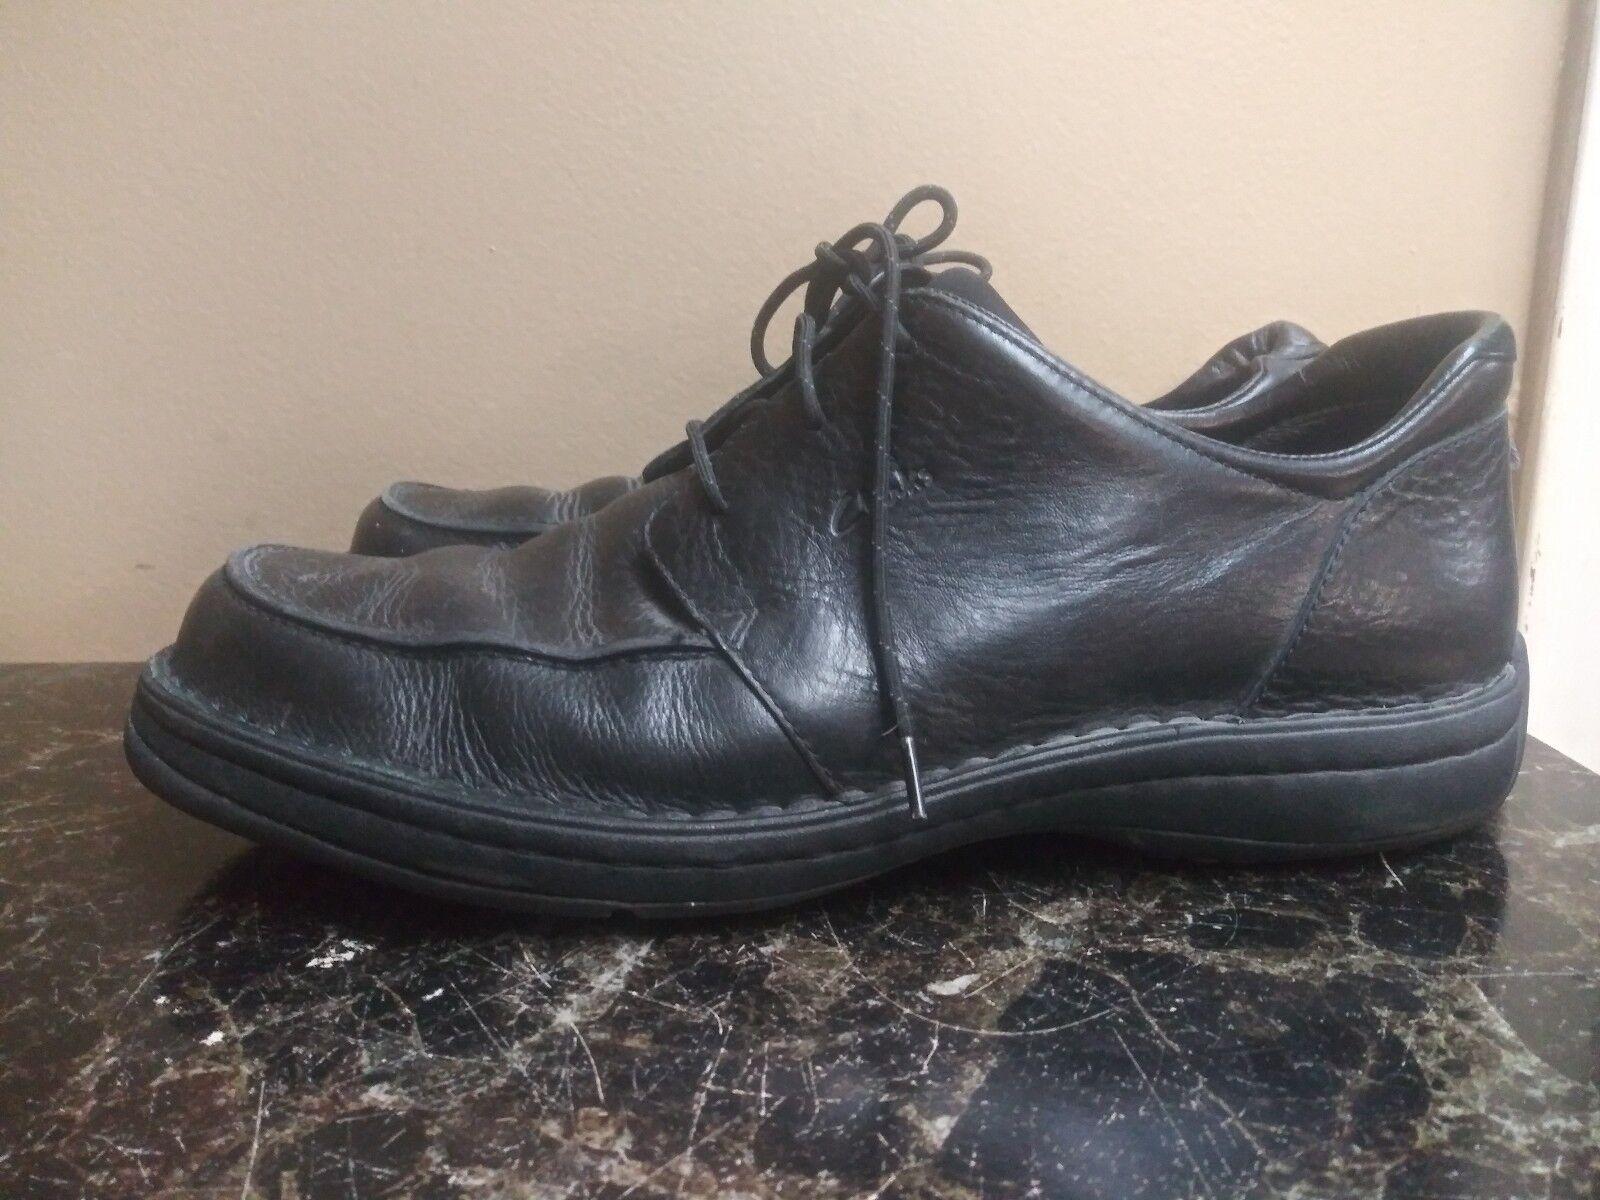 Clarks Men's Lace-Up Casual shoes Size 13M Black Leather